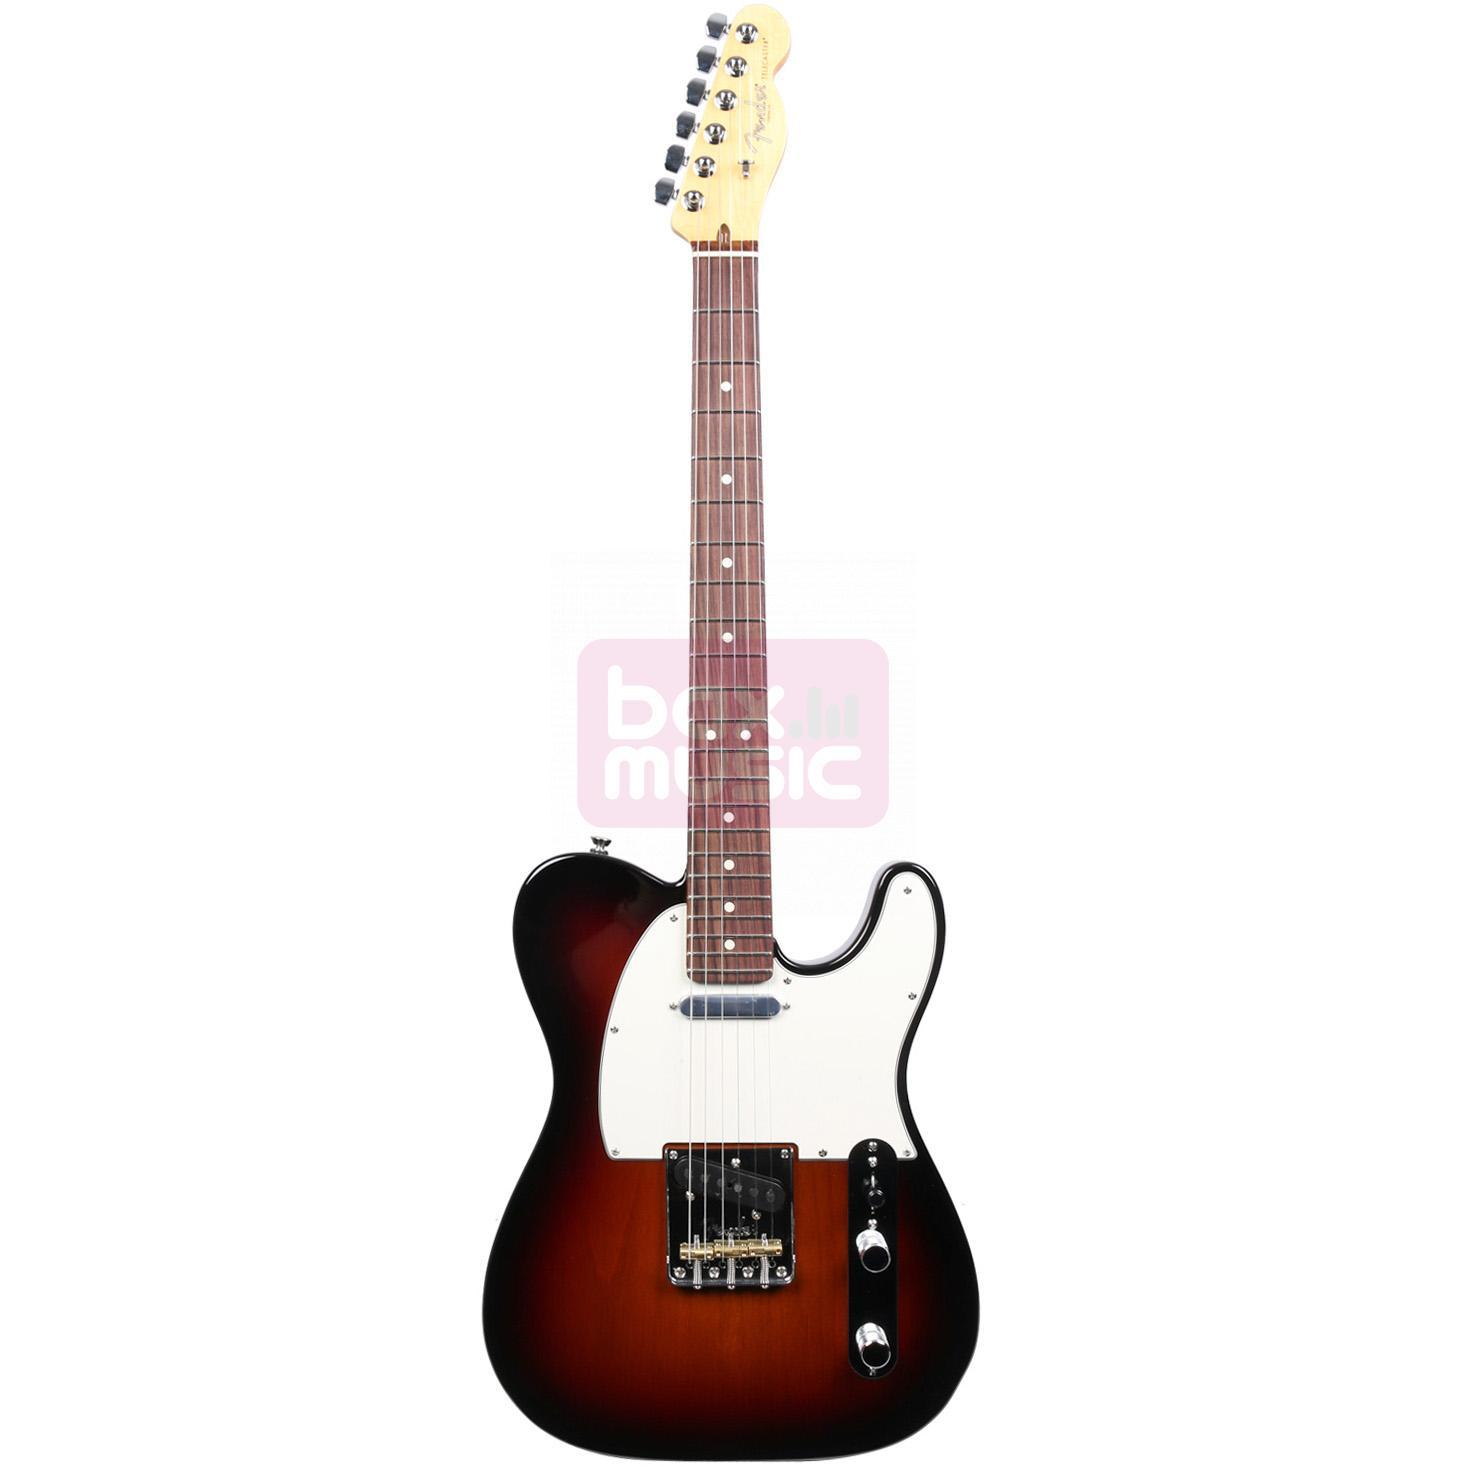 Fender American Professional Telecaster 3-Color Sunburst RW